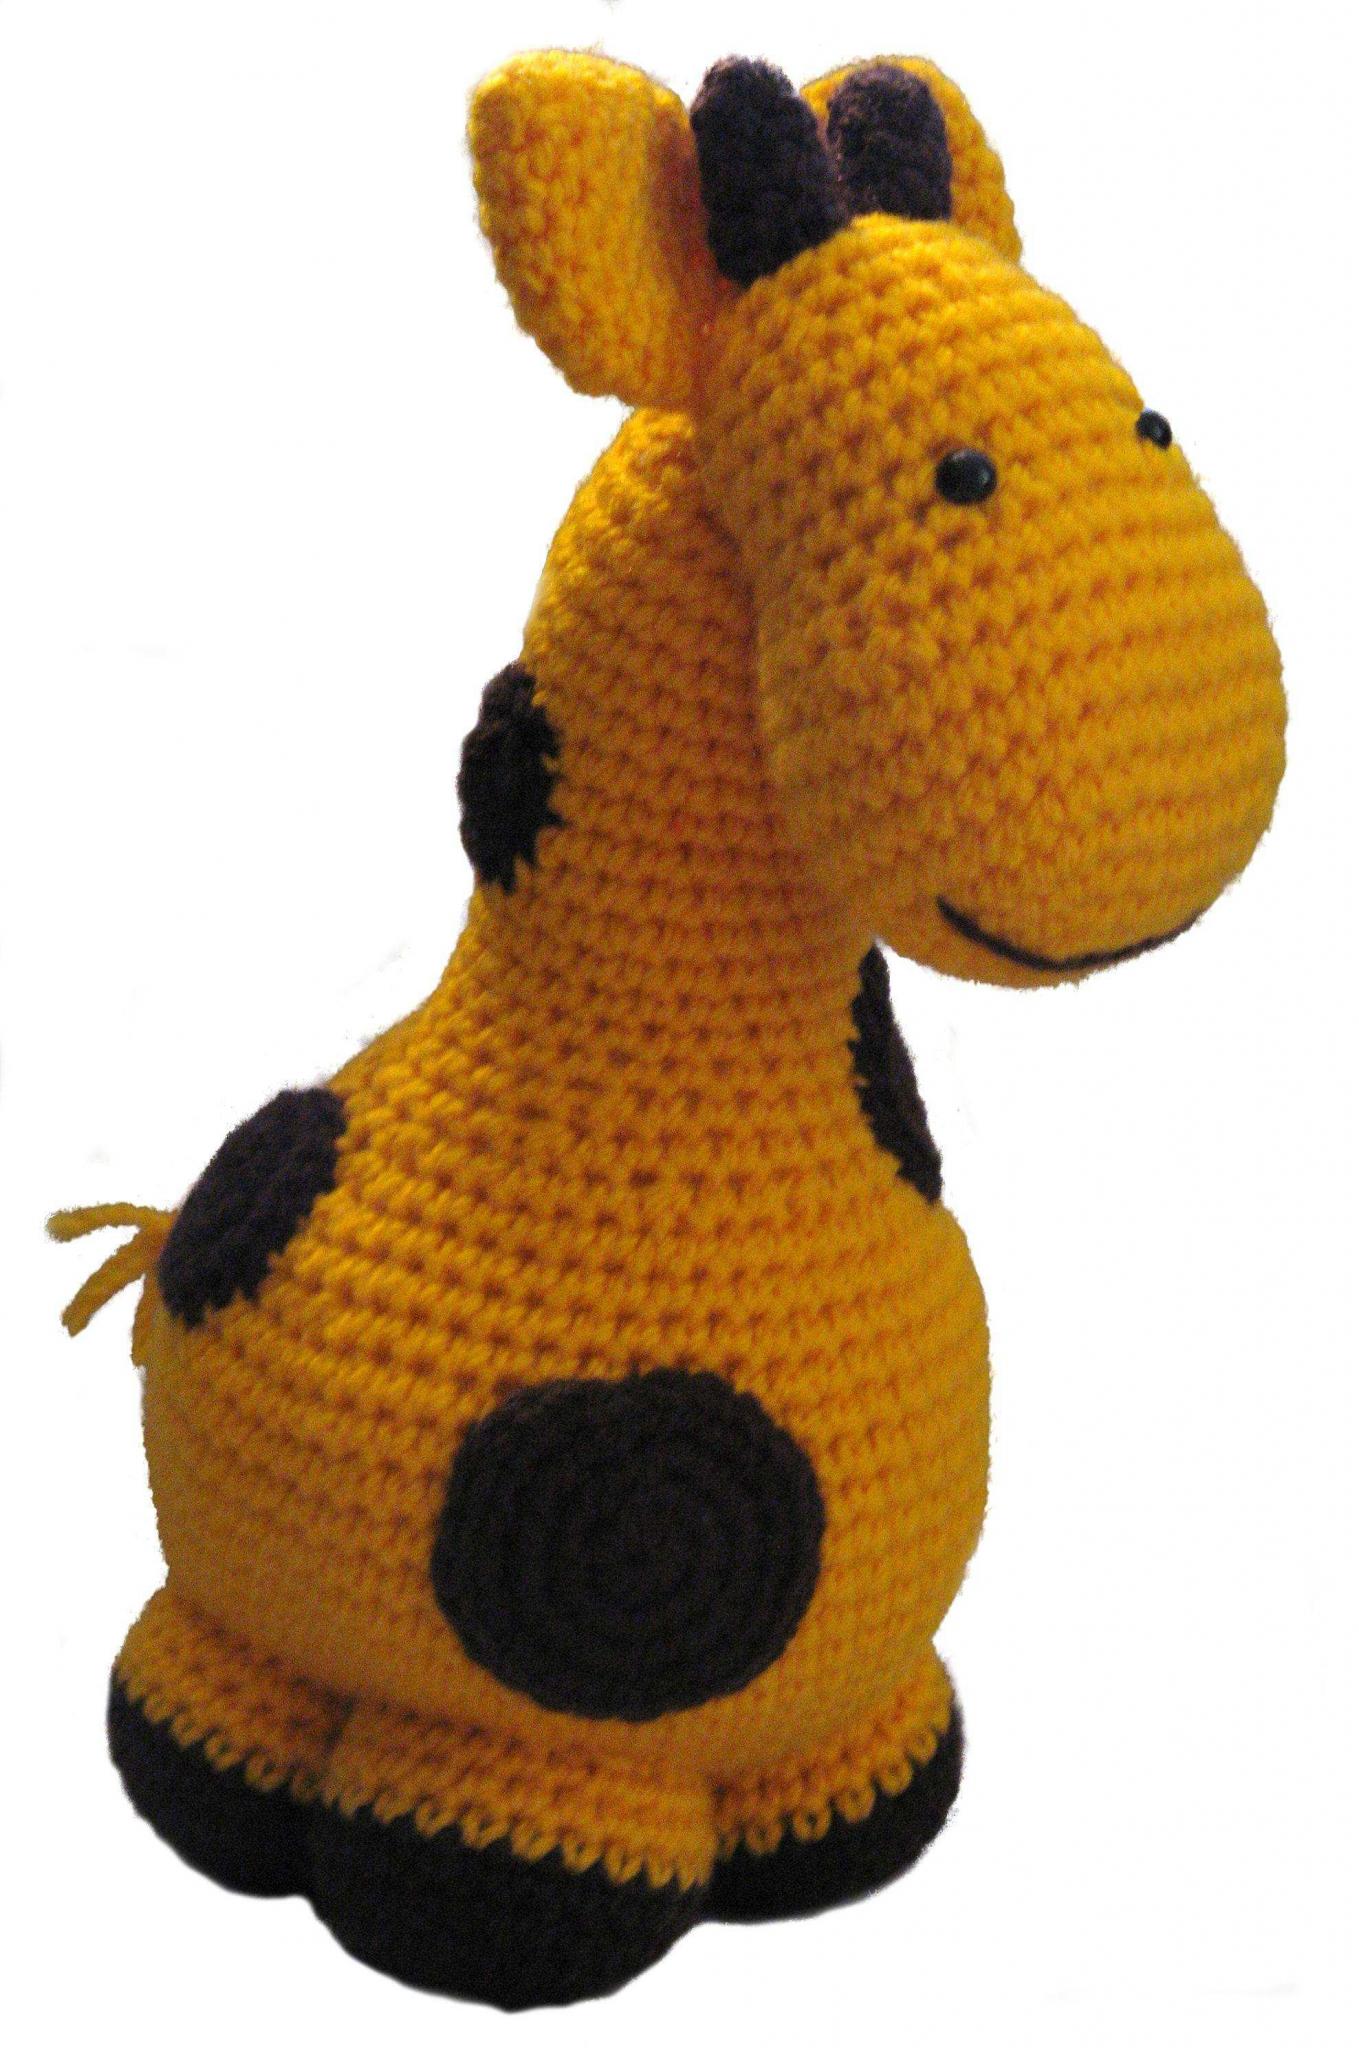 JIRAFA con corazón Amigurumi Crocheted peluche gran regalo o | Etsy | 2048x1359